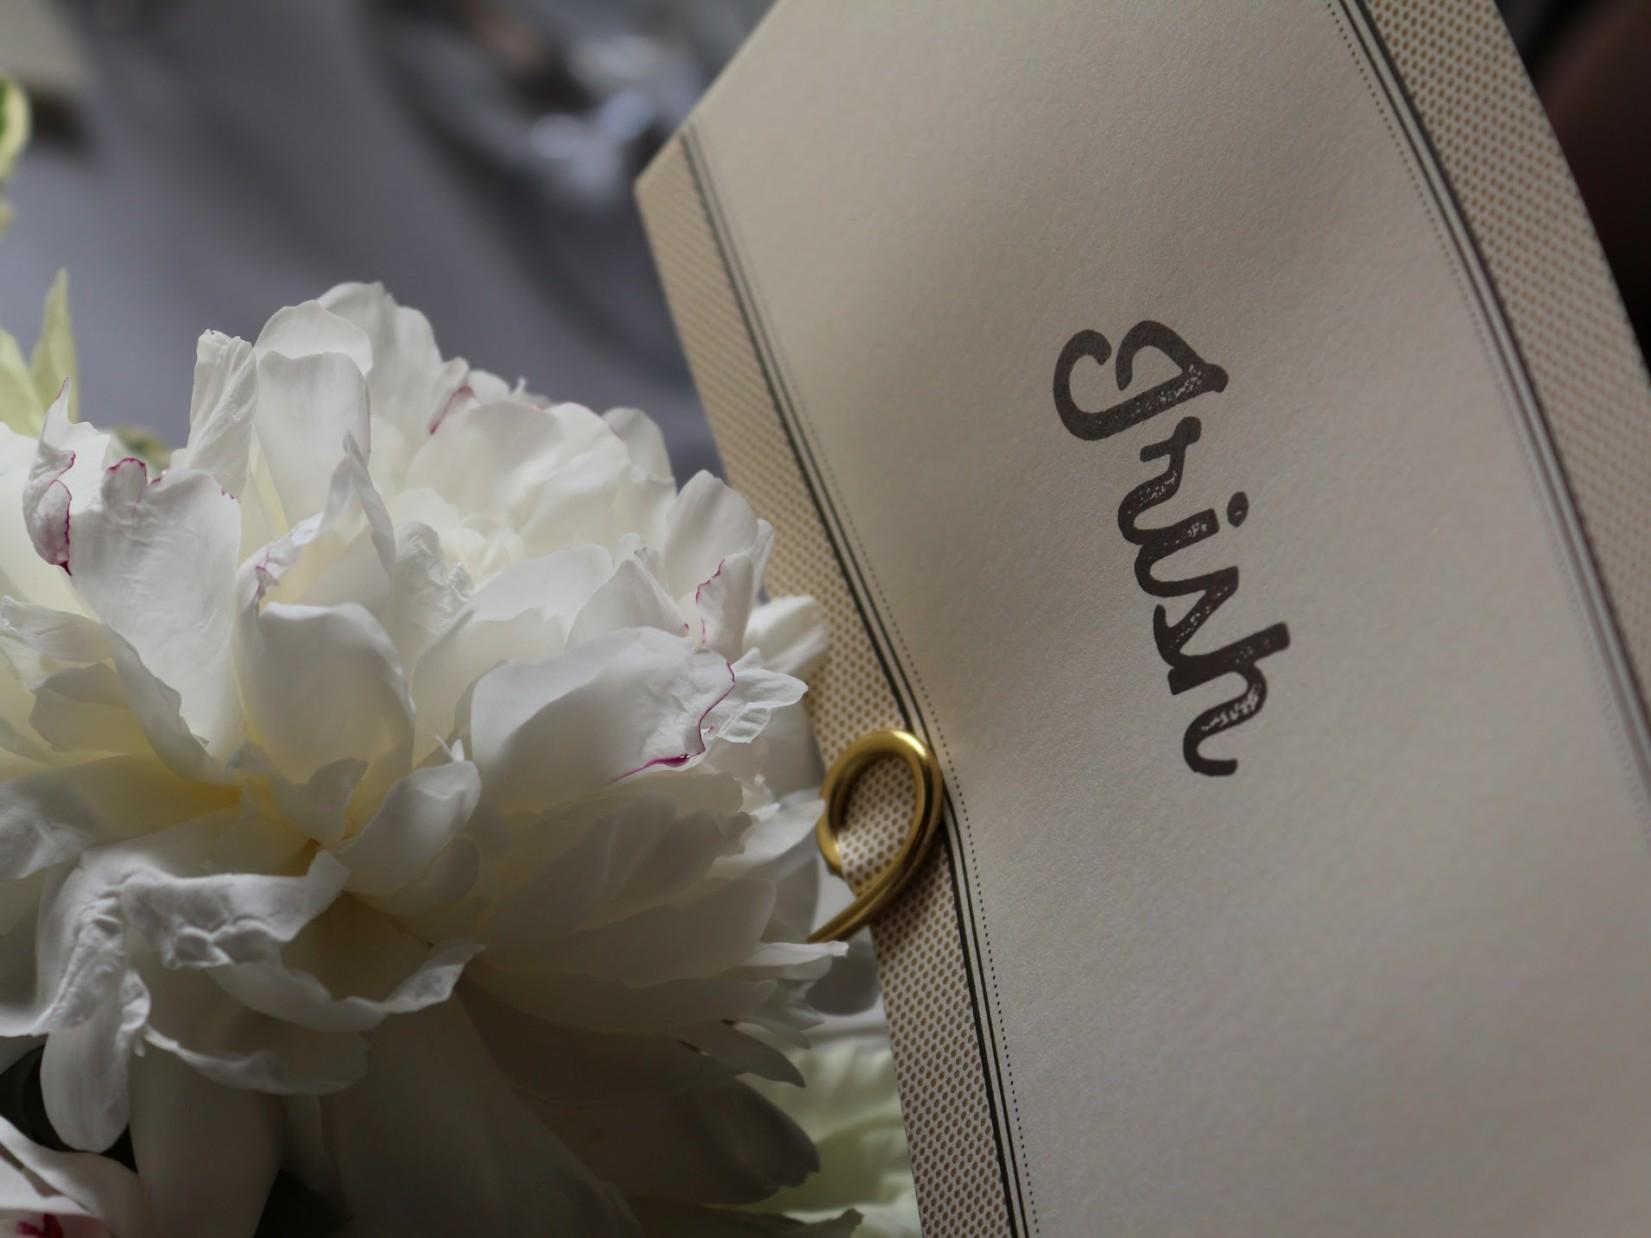 Tableau Matrimonio Azzurro : Tableau mariage tema trovami